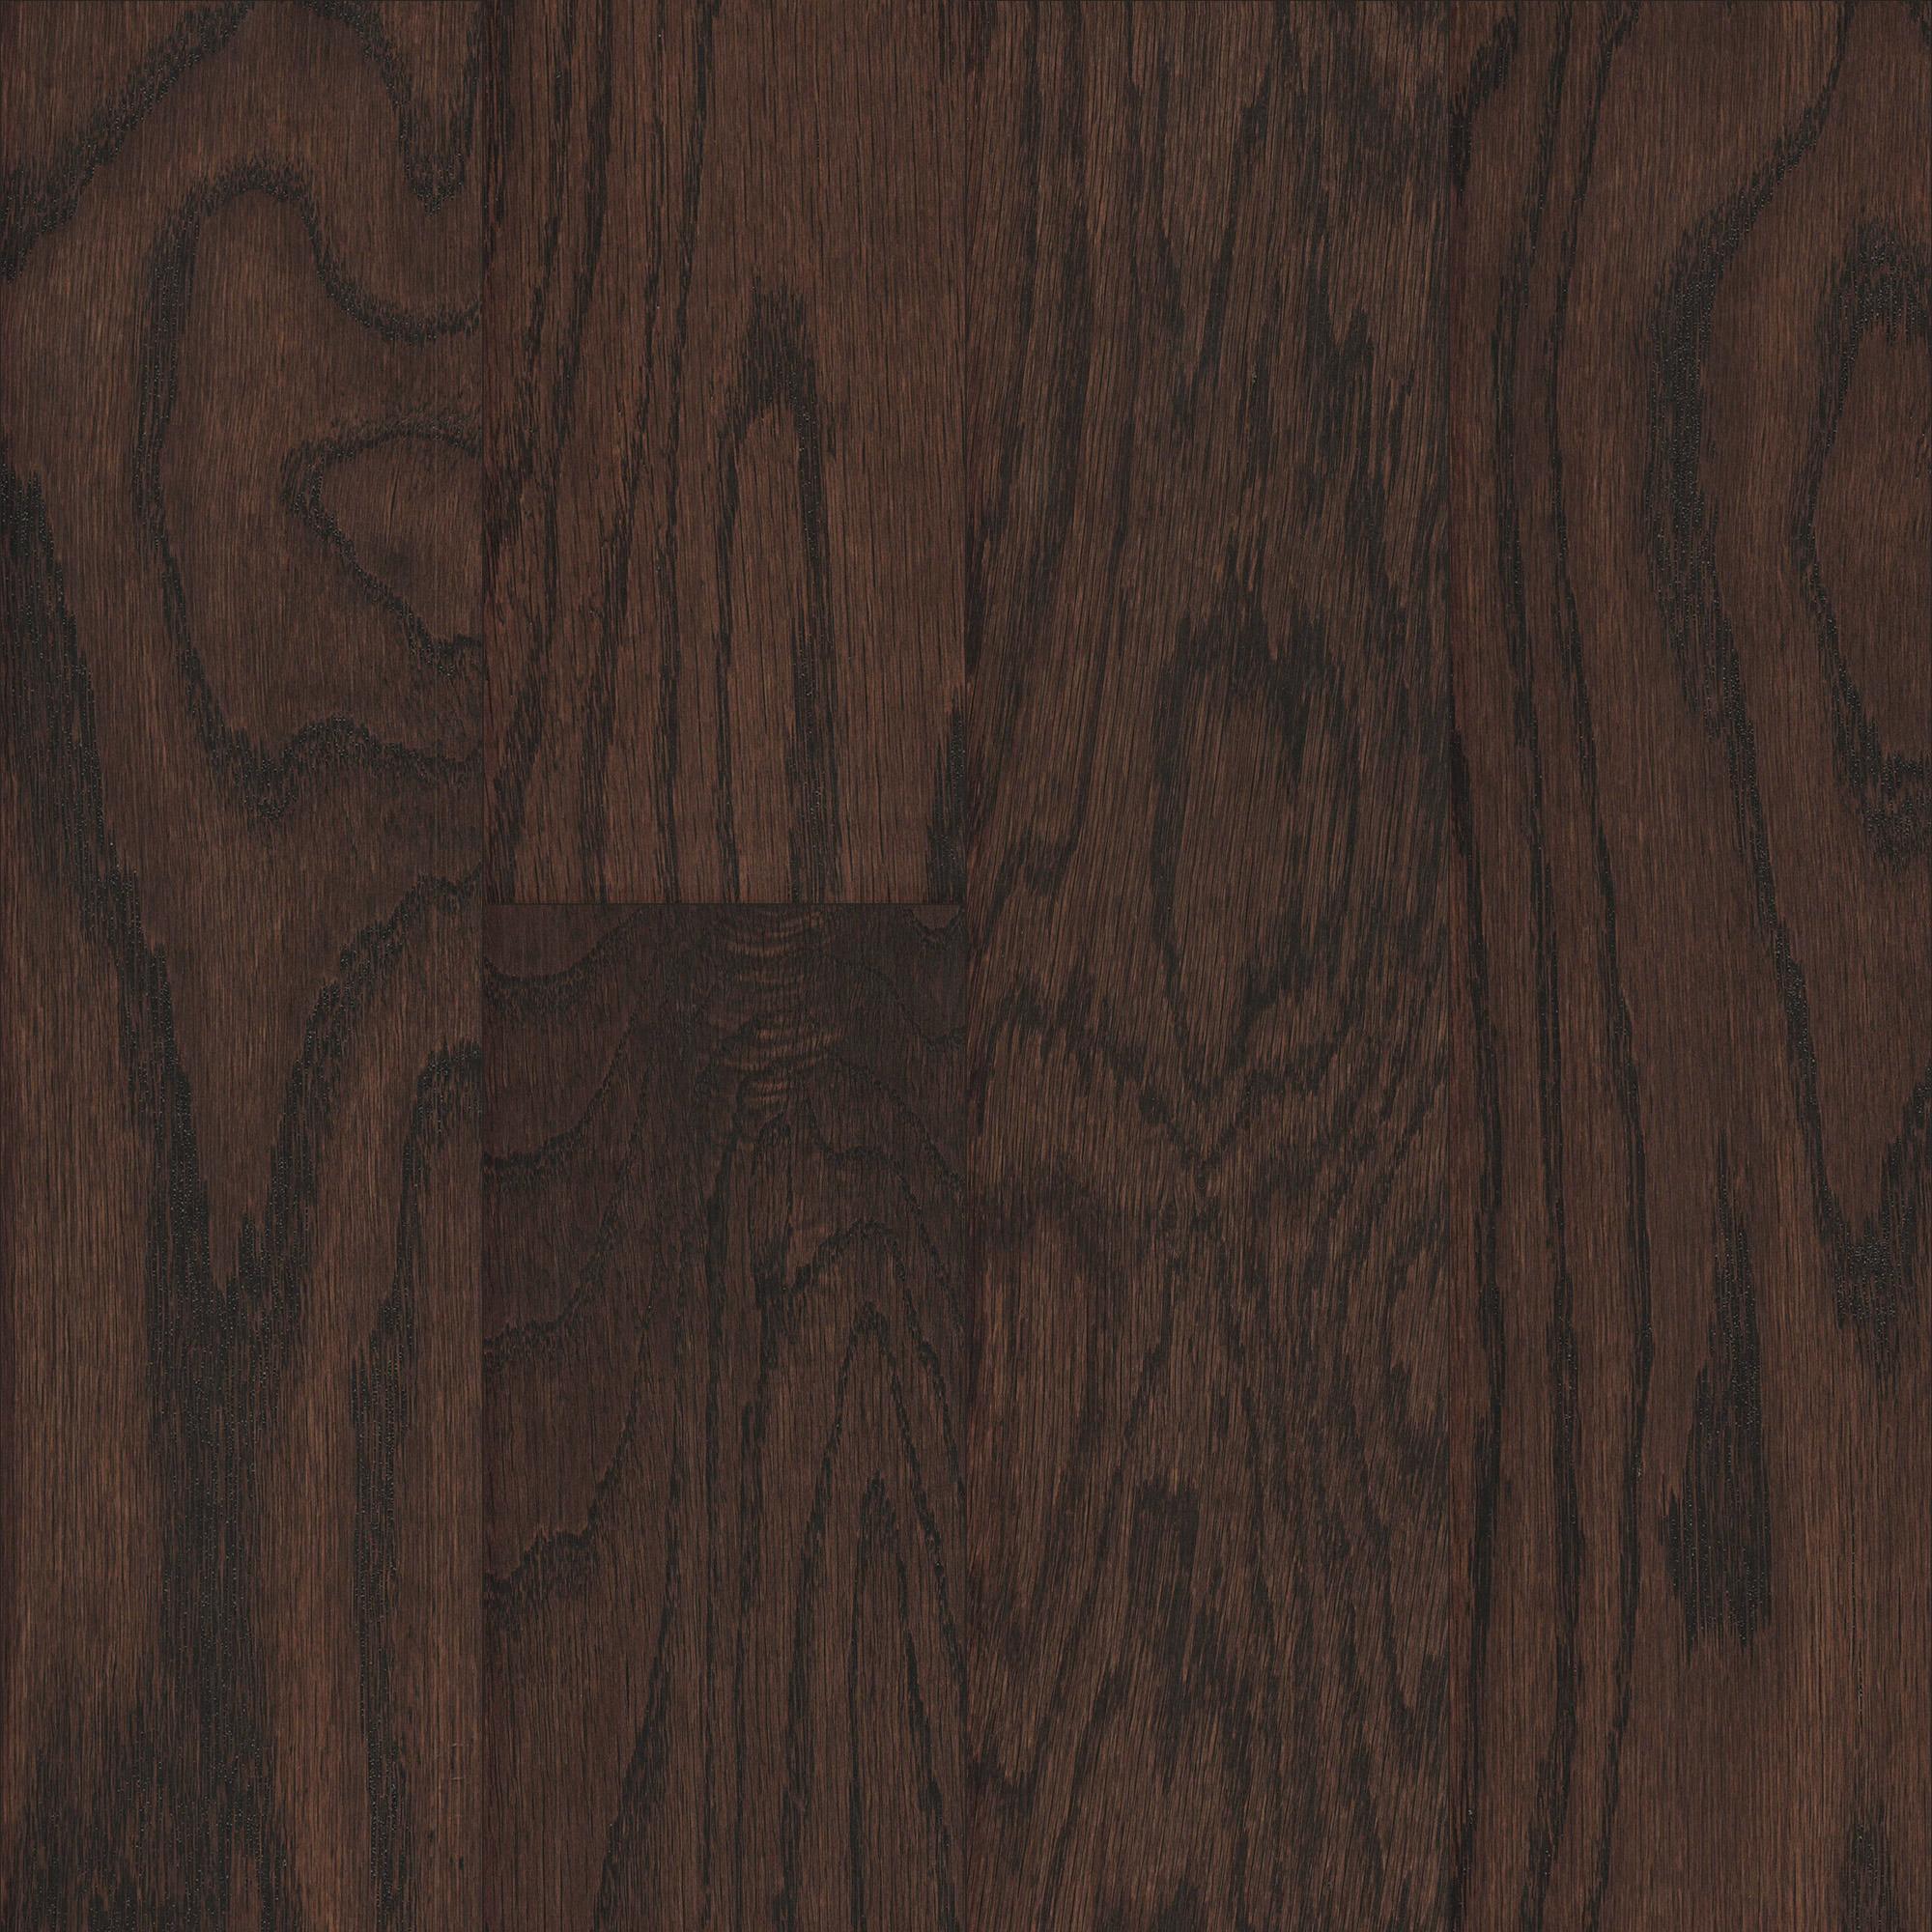 oak hardwood flooring colors of mullican ridgecrest oak burnt umber 1 2 thick 5 wide engineered within mullican ridgecrest oak burnt umber 1 2 thick 5 wide engineered hardwood flooring